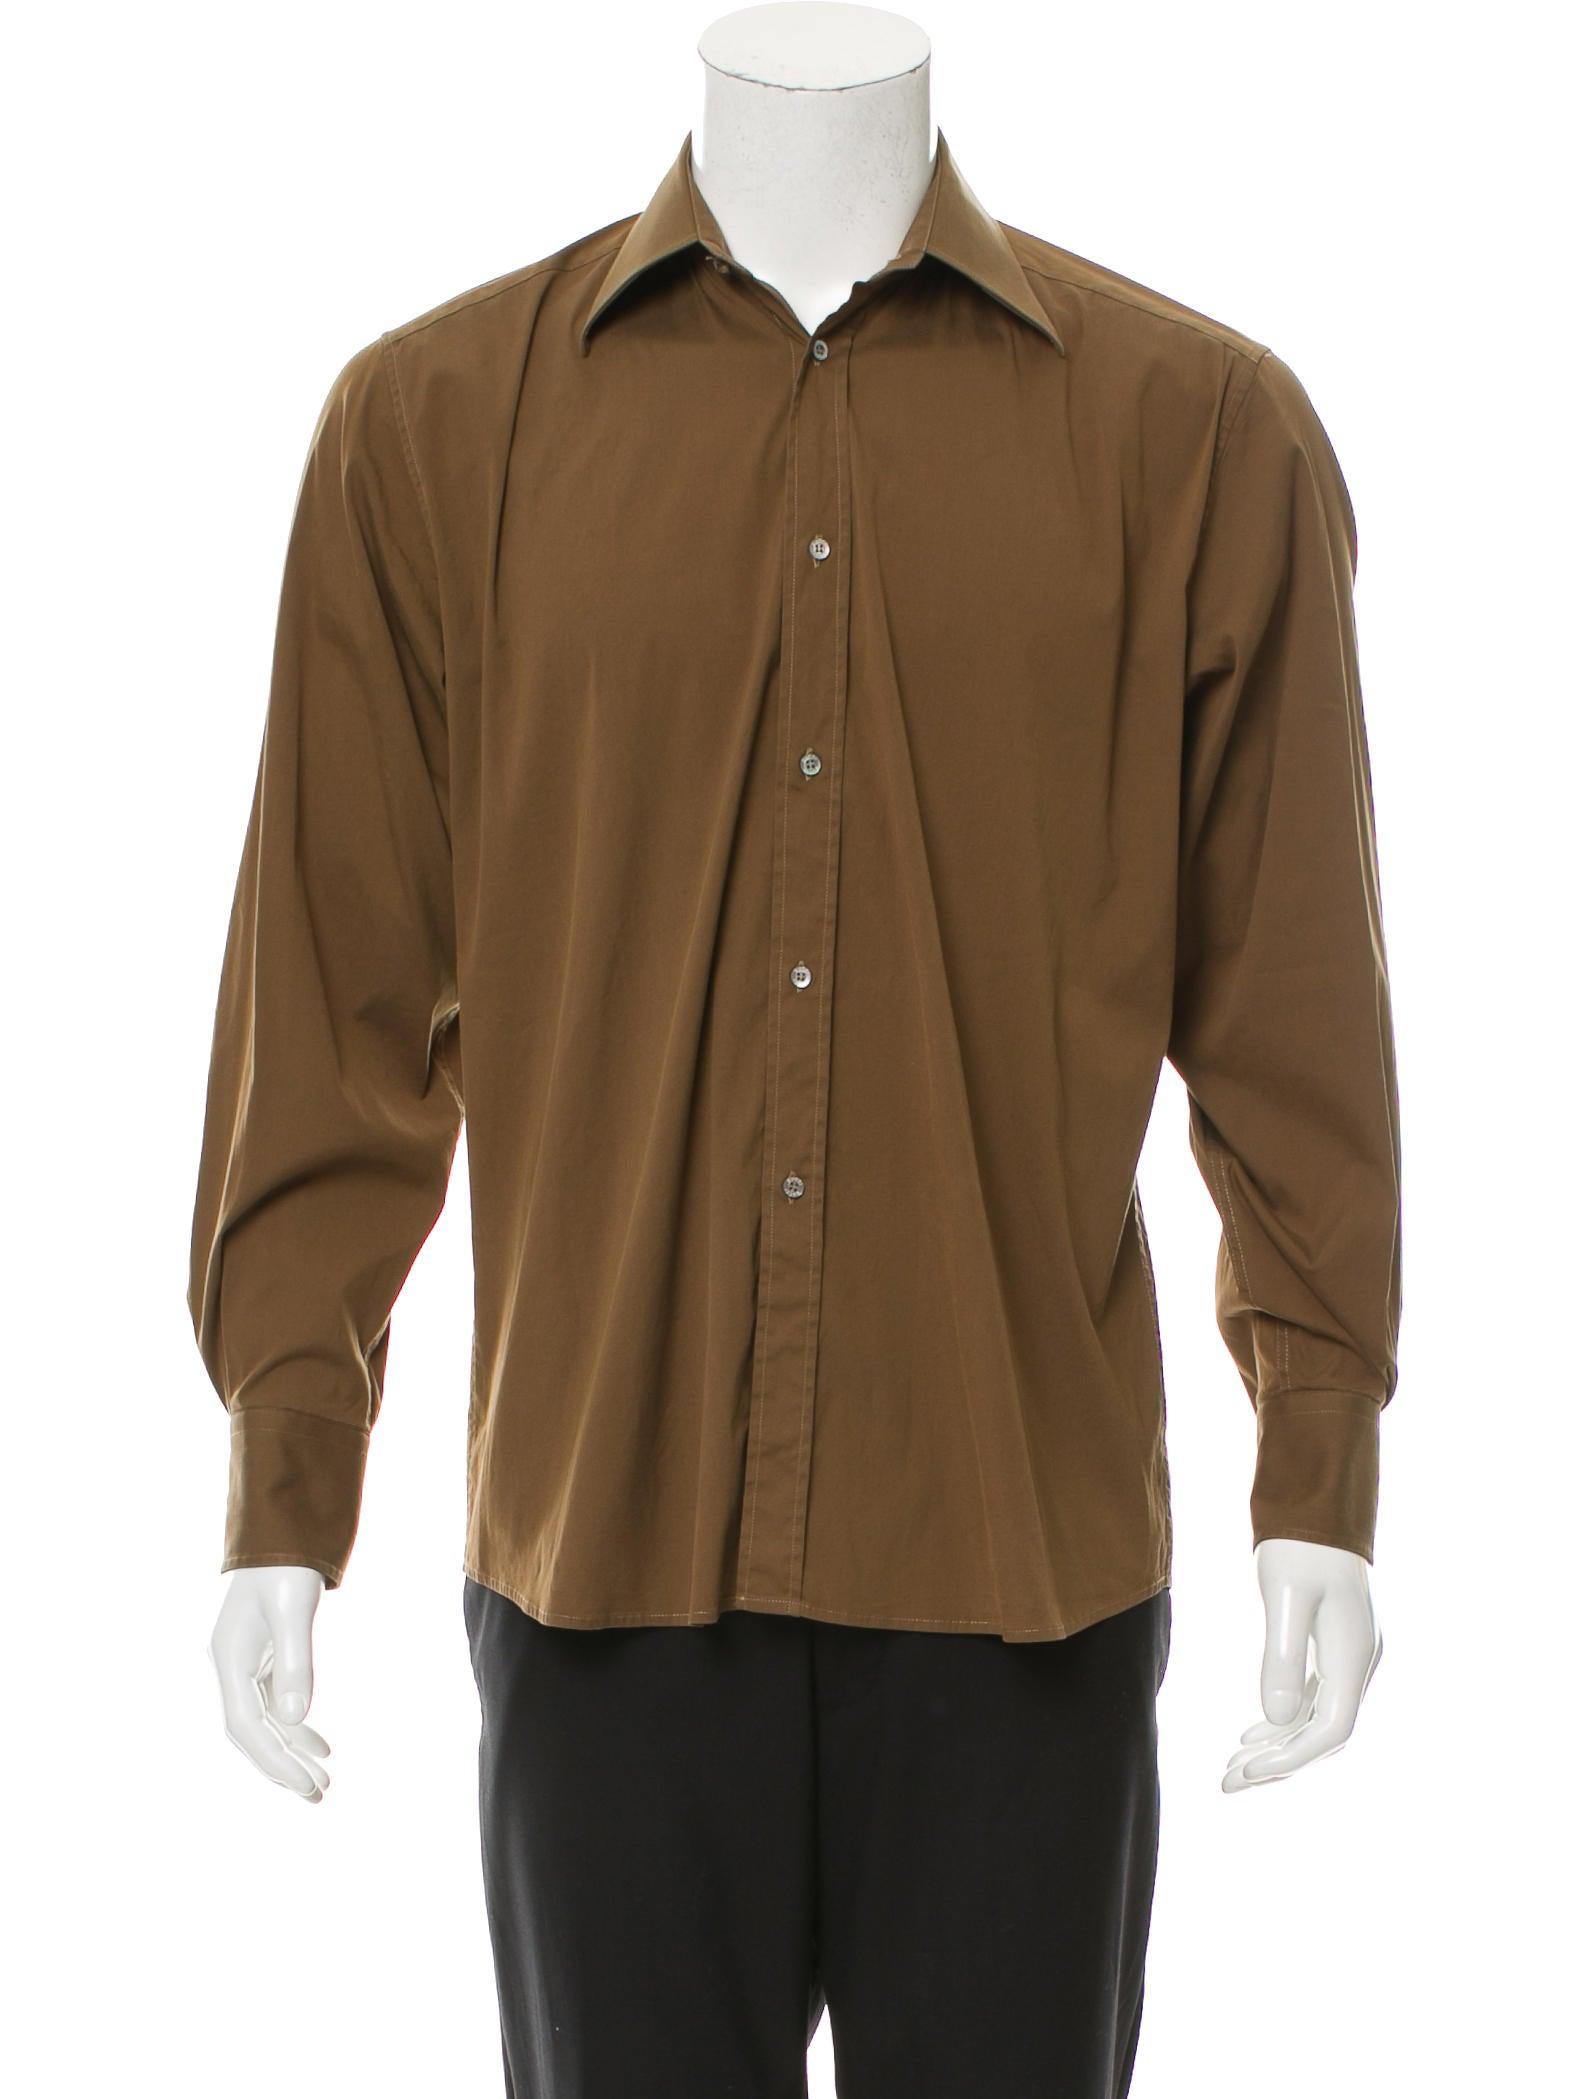 Gucci Long Sleeve Button Up Shirt Clothing Guc159407